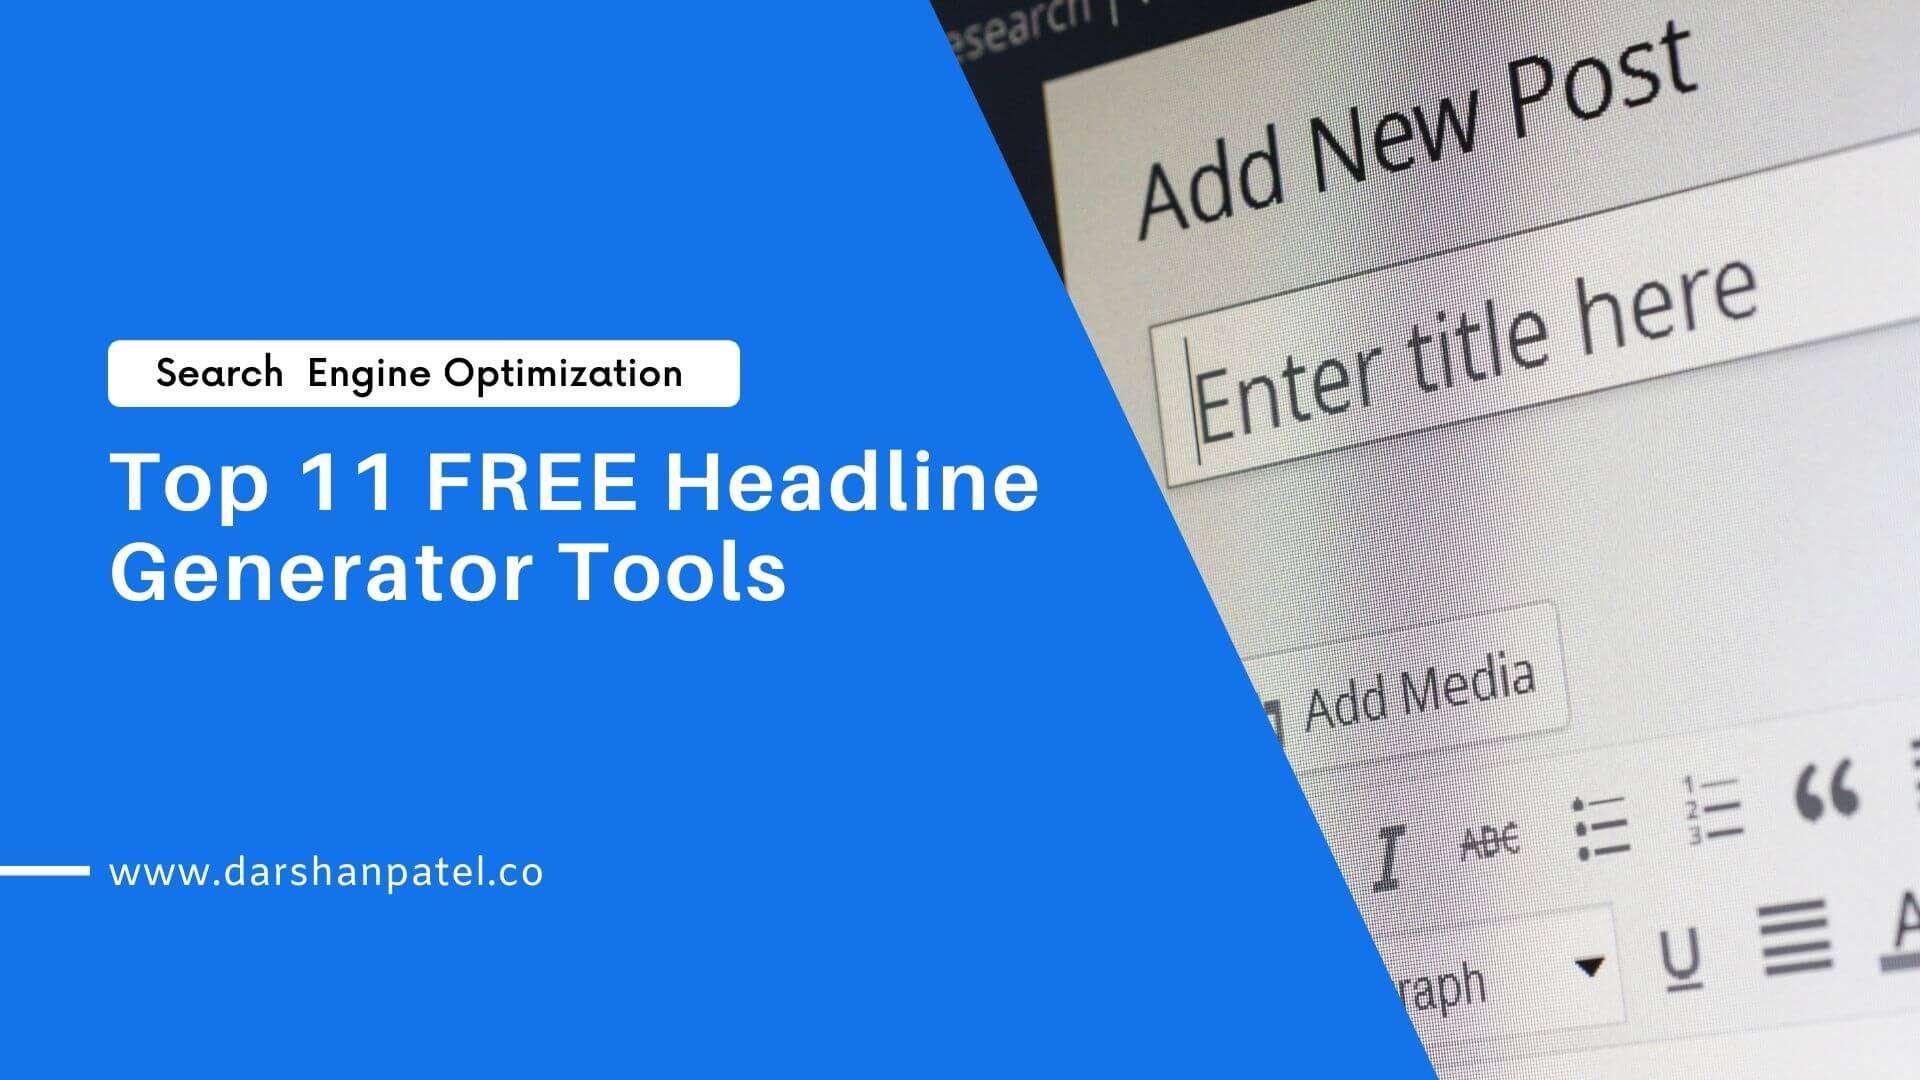 Top 11 FREE Headline Generator Tools